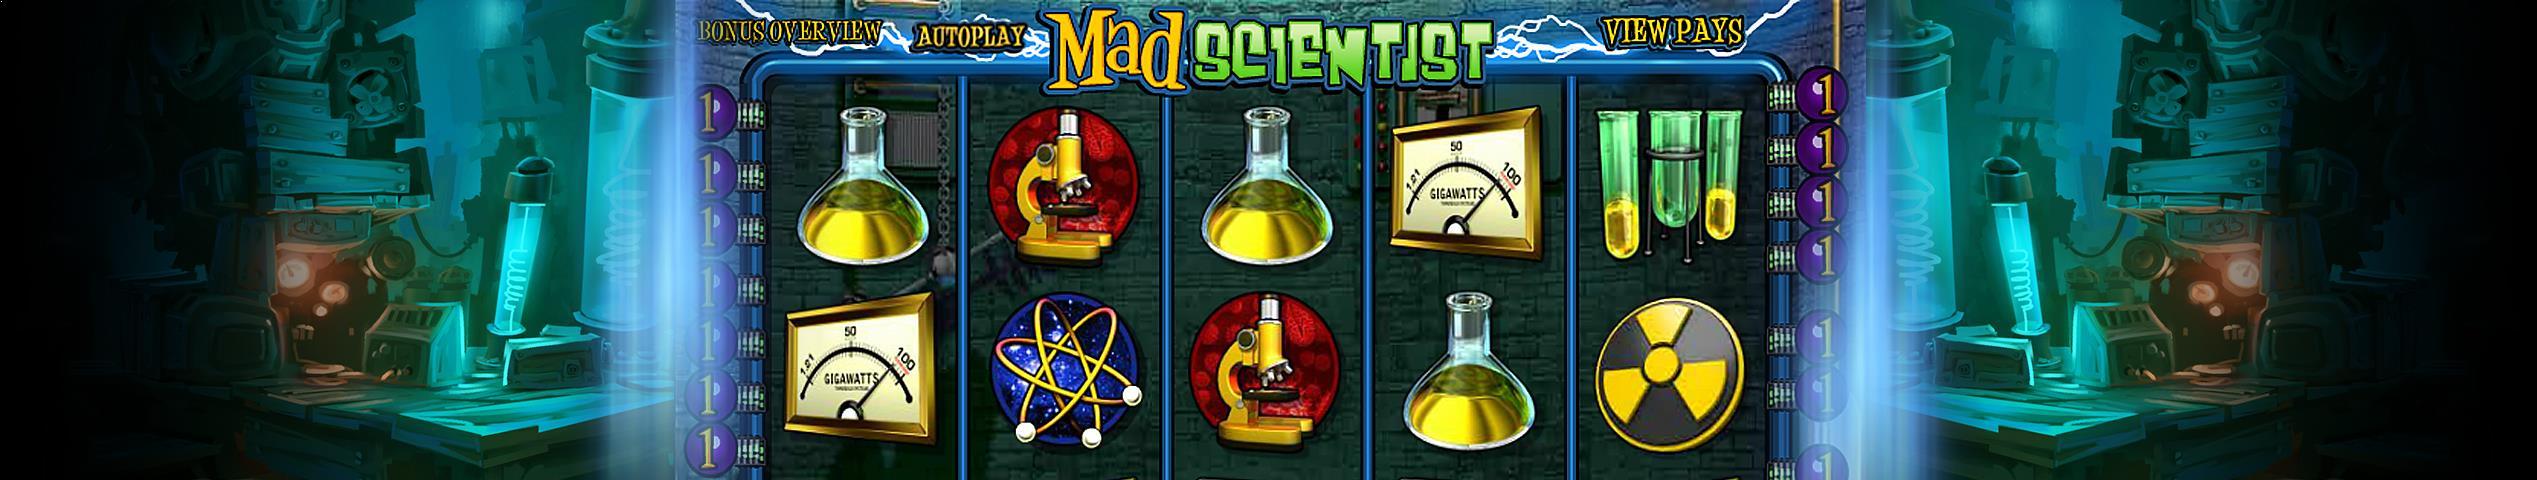 Mad Scientist betsoft jocuri slot slider